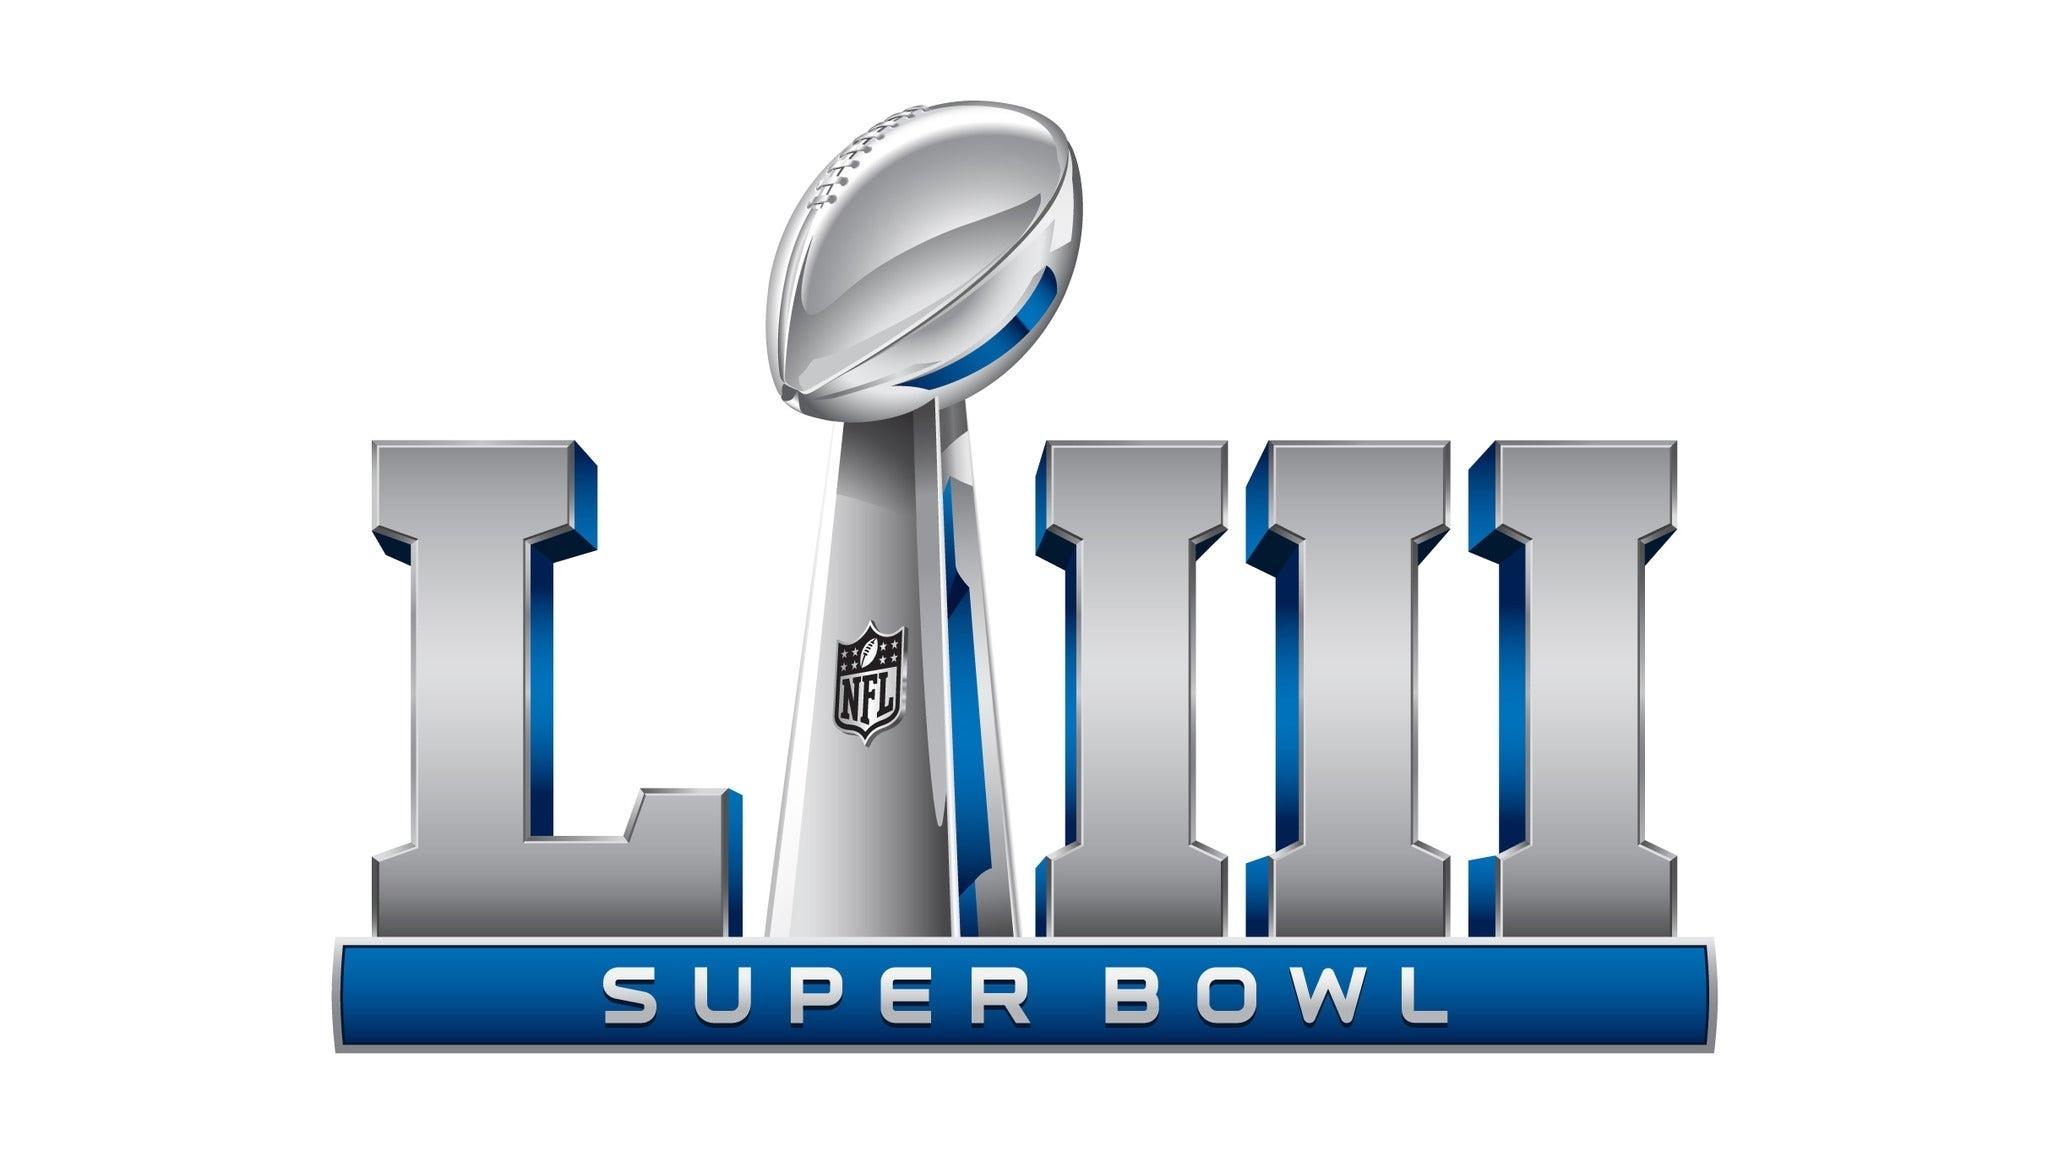 Super Bowl Liii Tickets   Single Game Tickets & Schedule inside Super Bowl 2020 Tickets